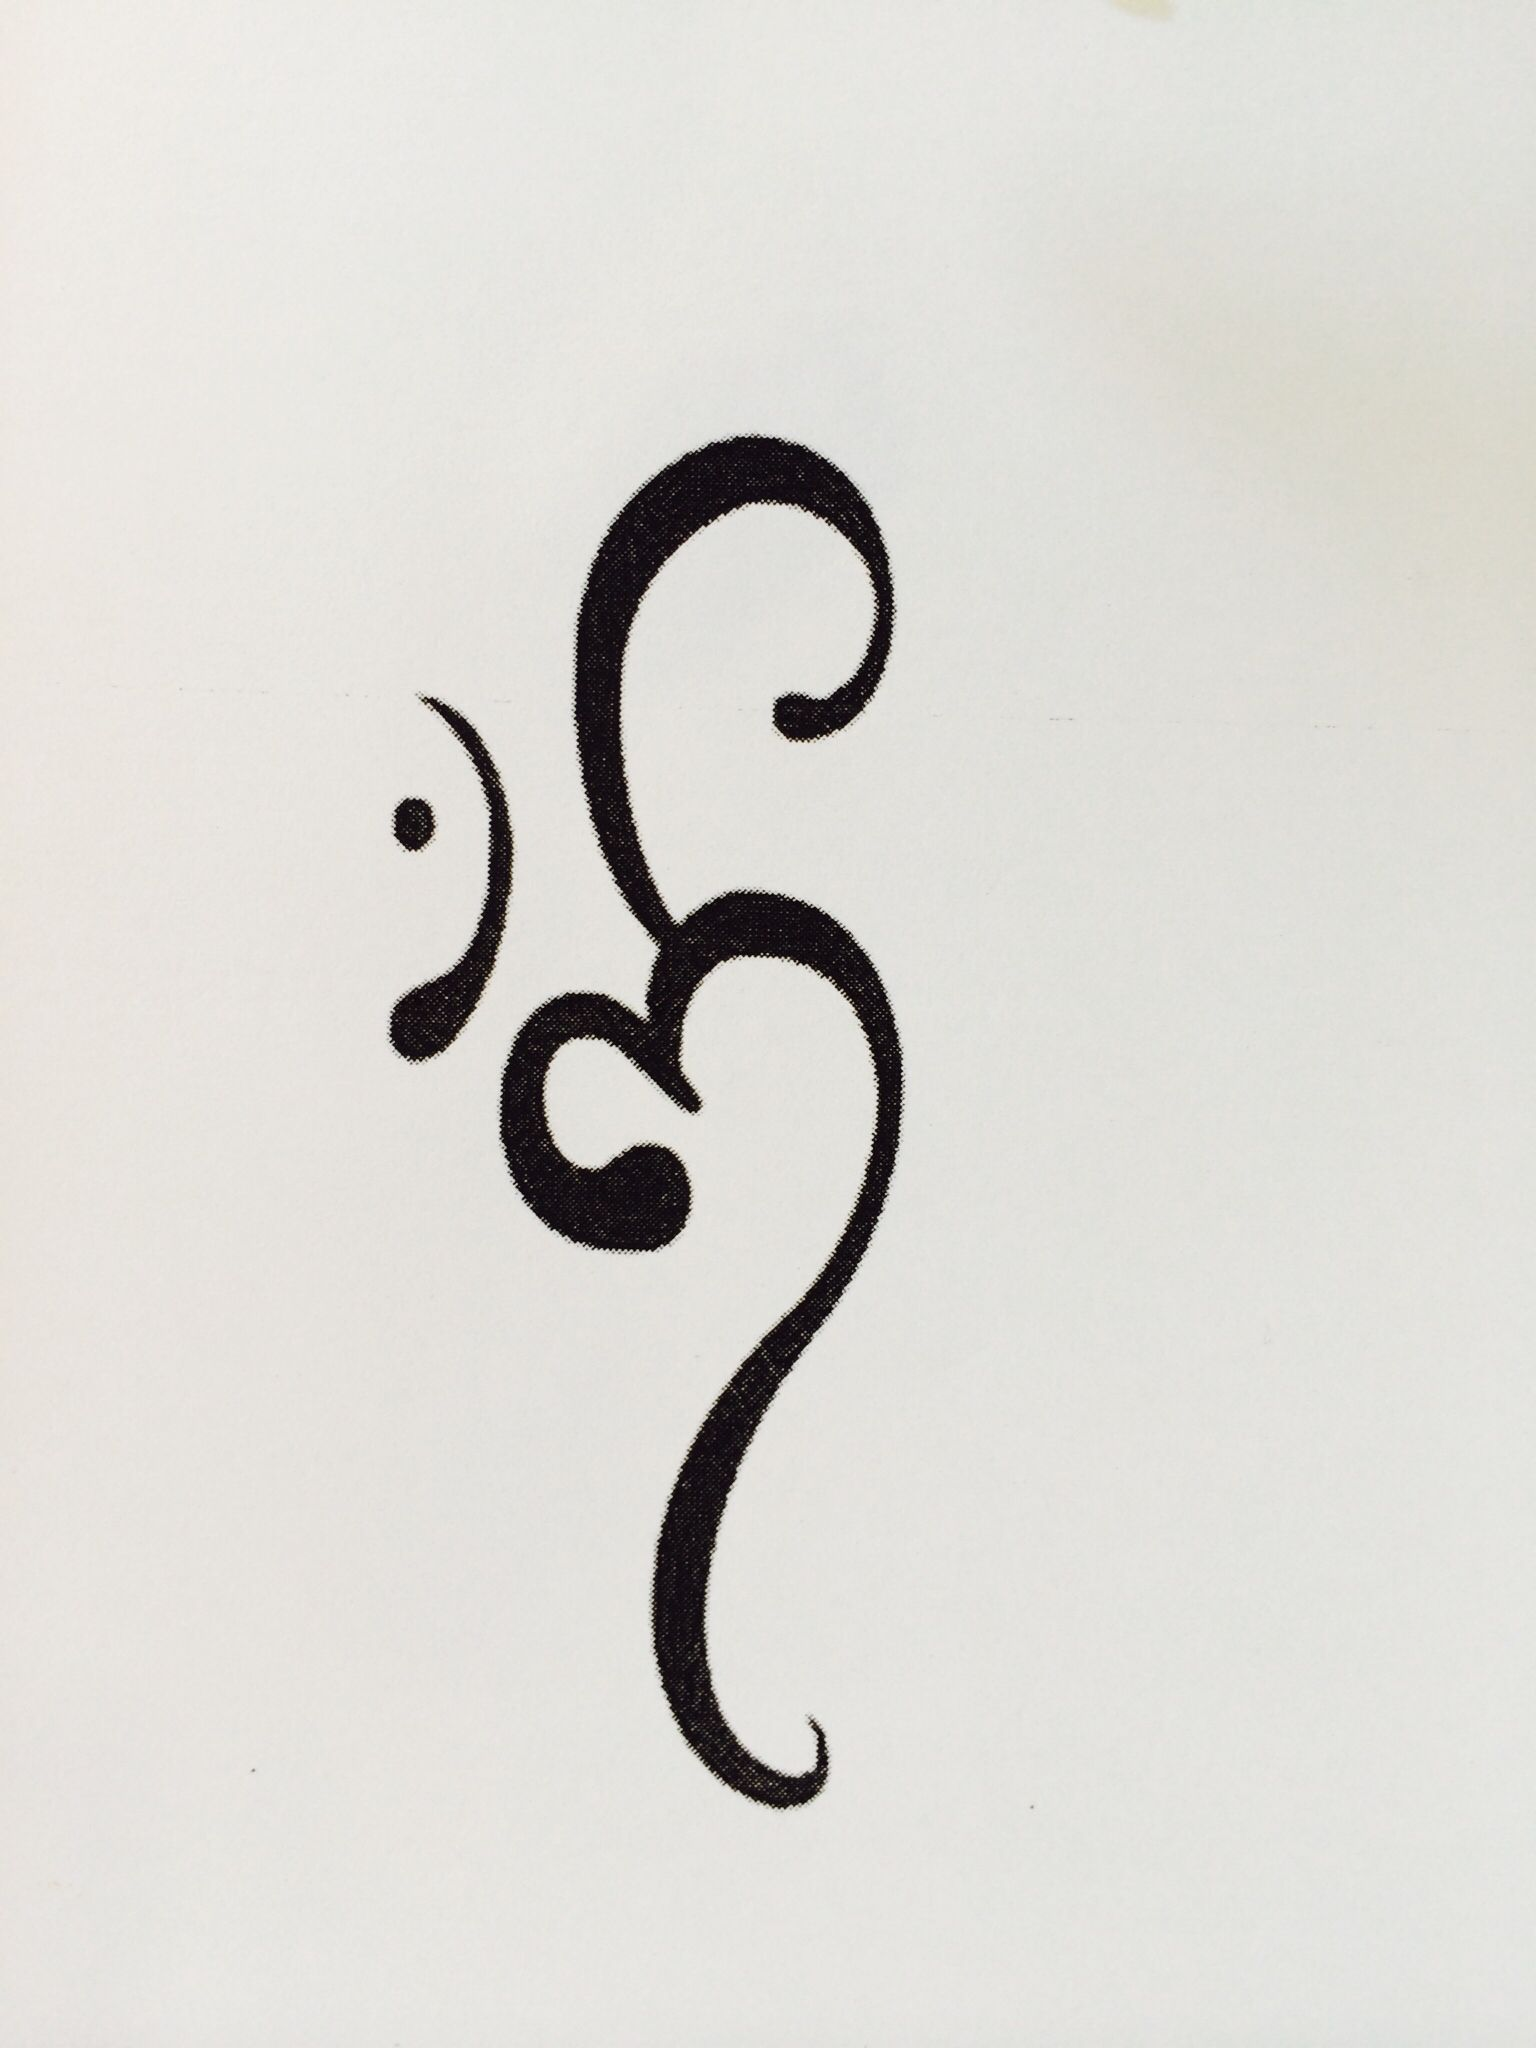 Inspiration For An Ohmaum Tattoo Tattoo Designs Pinterest